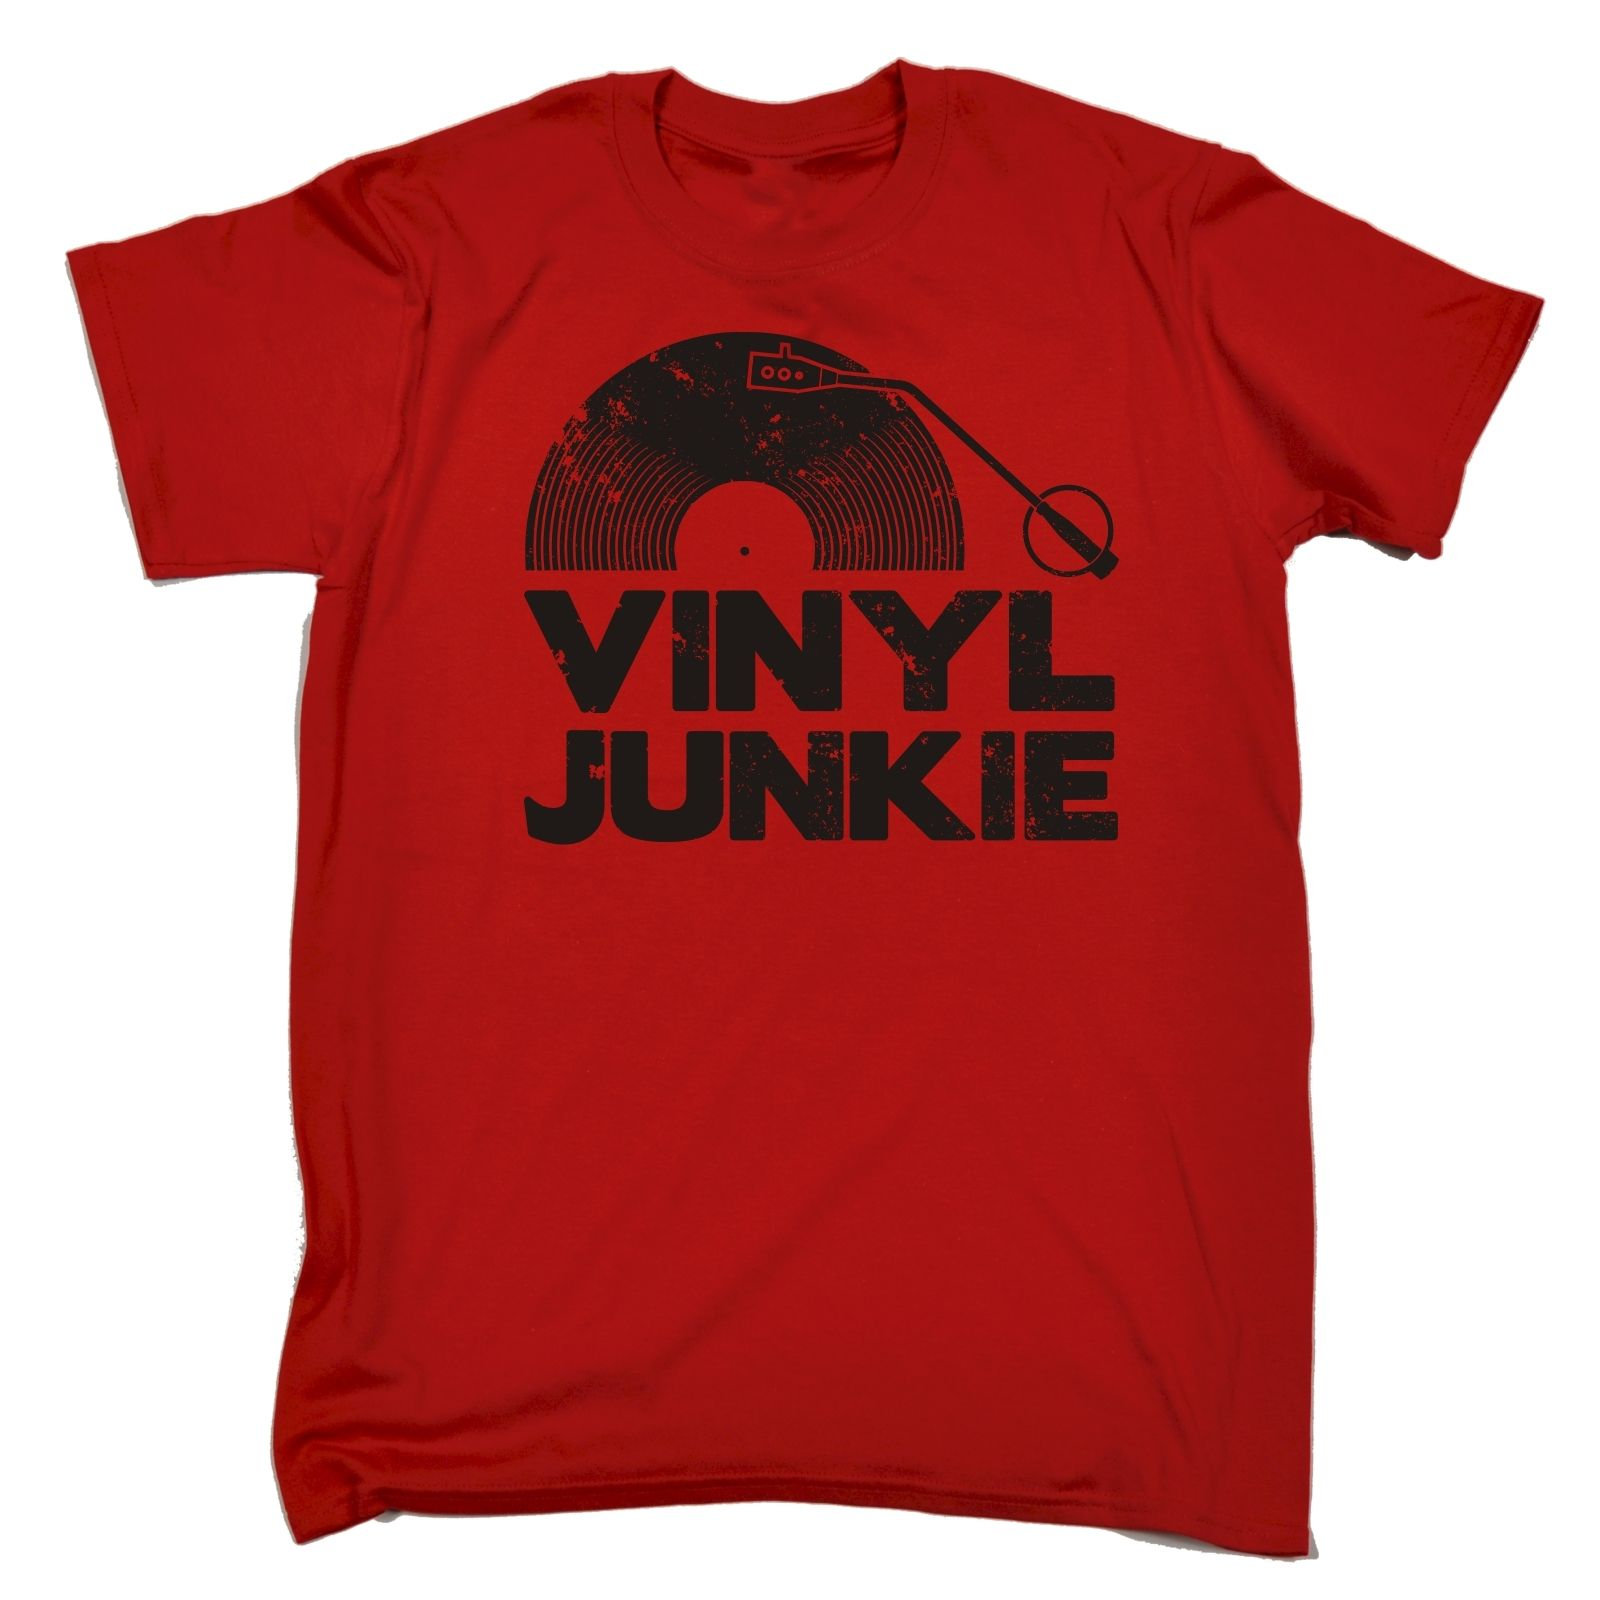 Vinyl Junkie T Shirt Tee Music Dj Record Funny Birthday Gift Present